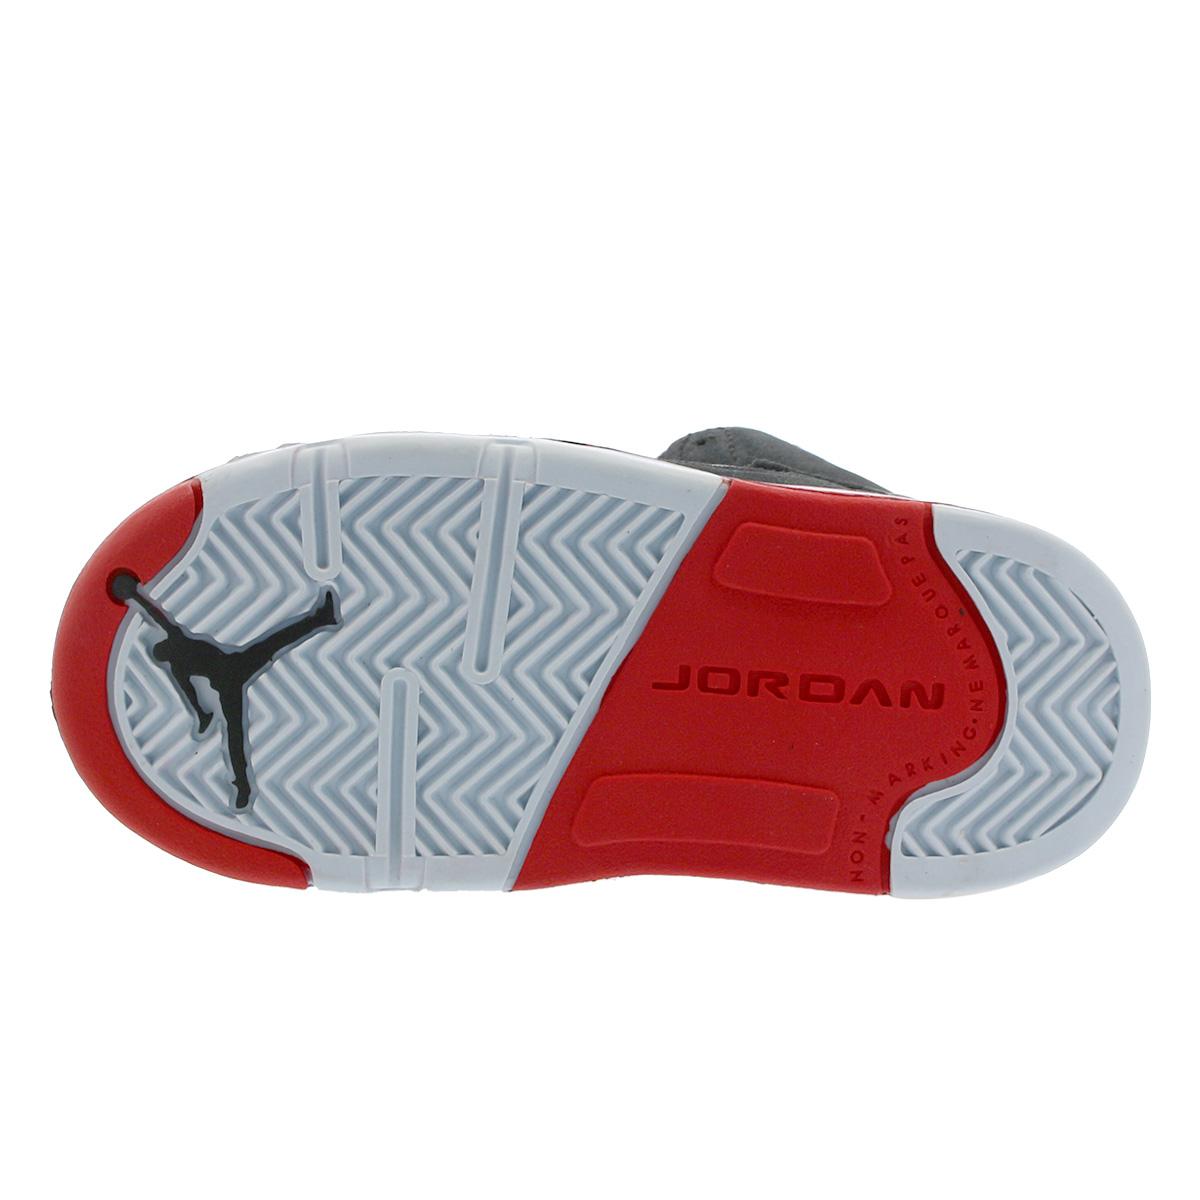 hot sale online f92fb 822f3 NIKE AIR JORDAN 5 RETRO BT Nike Air Jordan 5 nostalgic BT BLACK/UNIVERSITY  RED 440,890-006